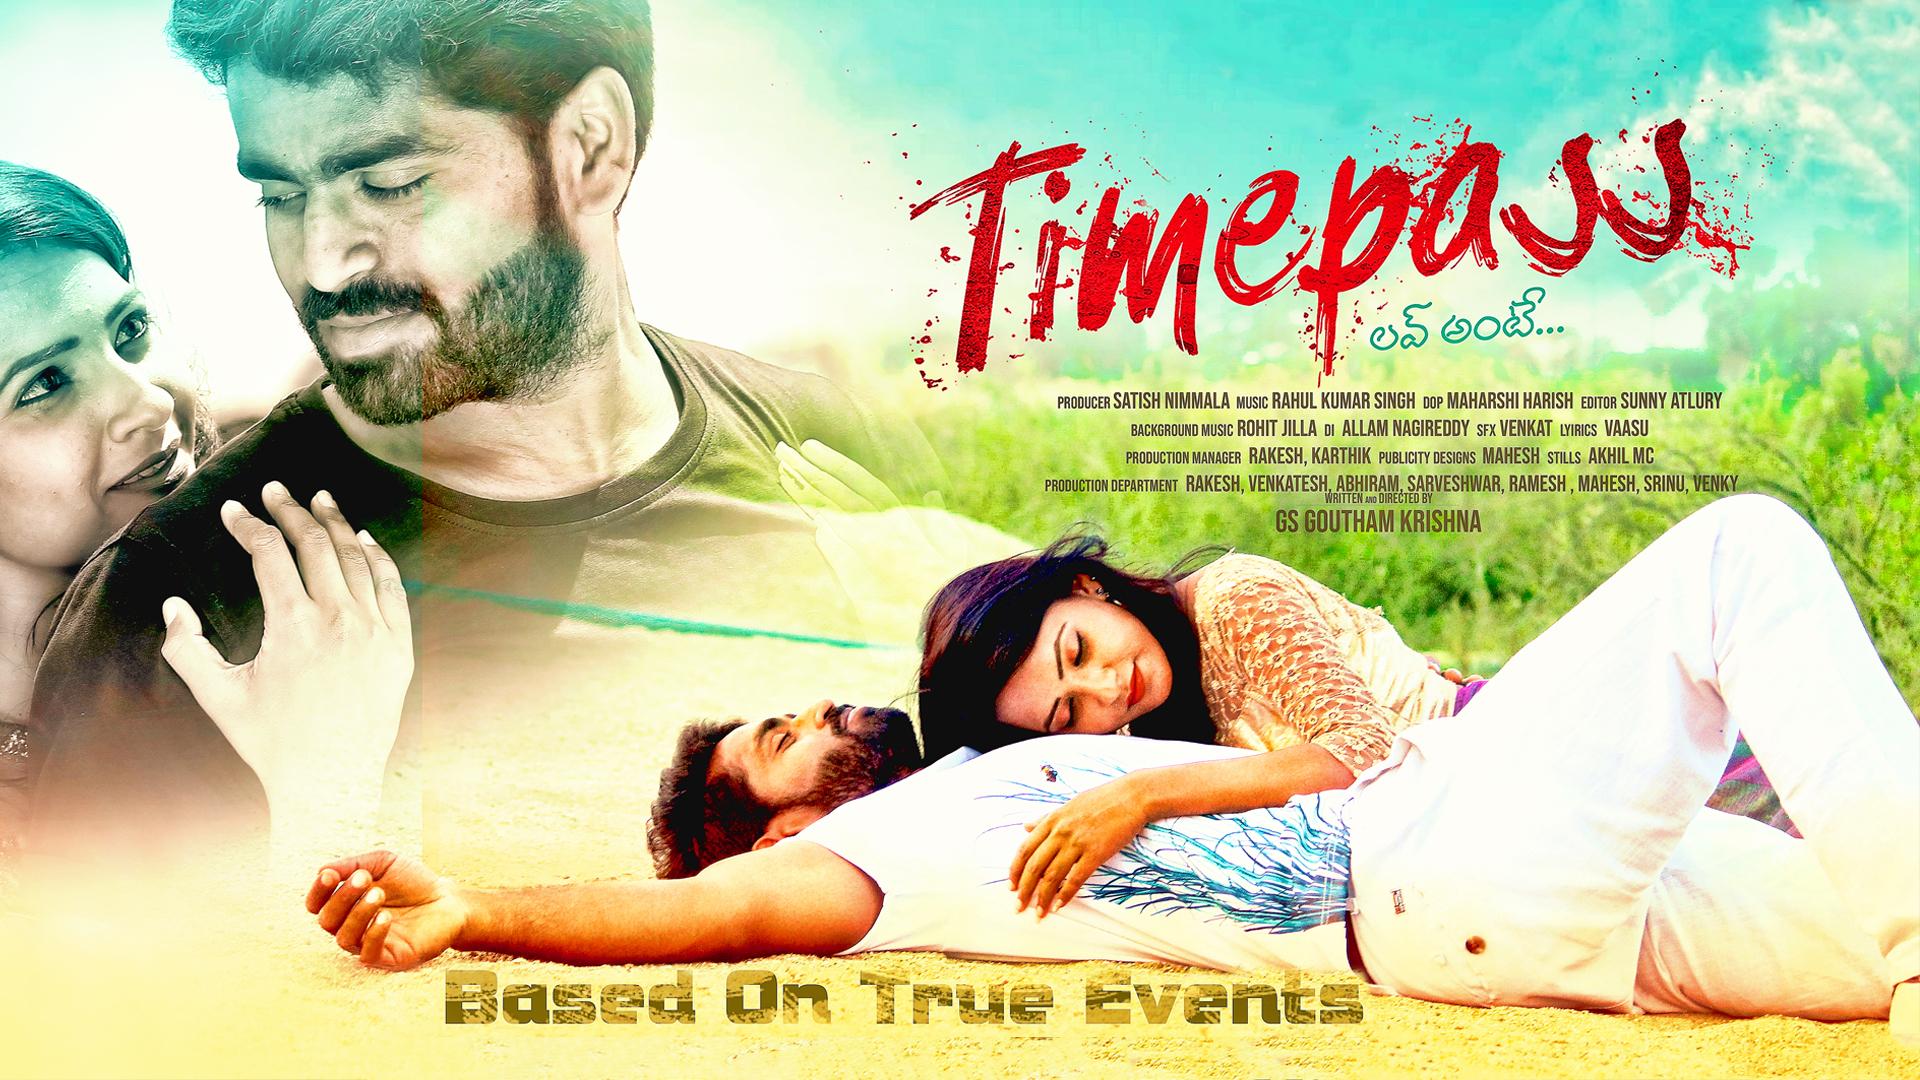 Timepass love antey